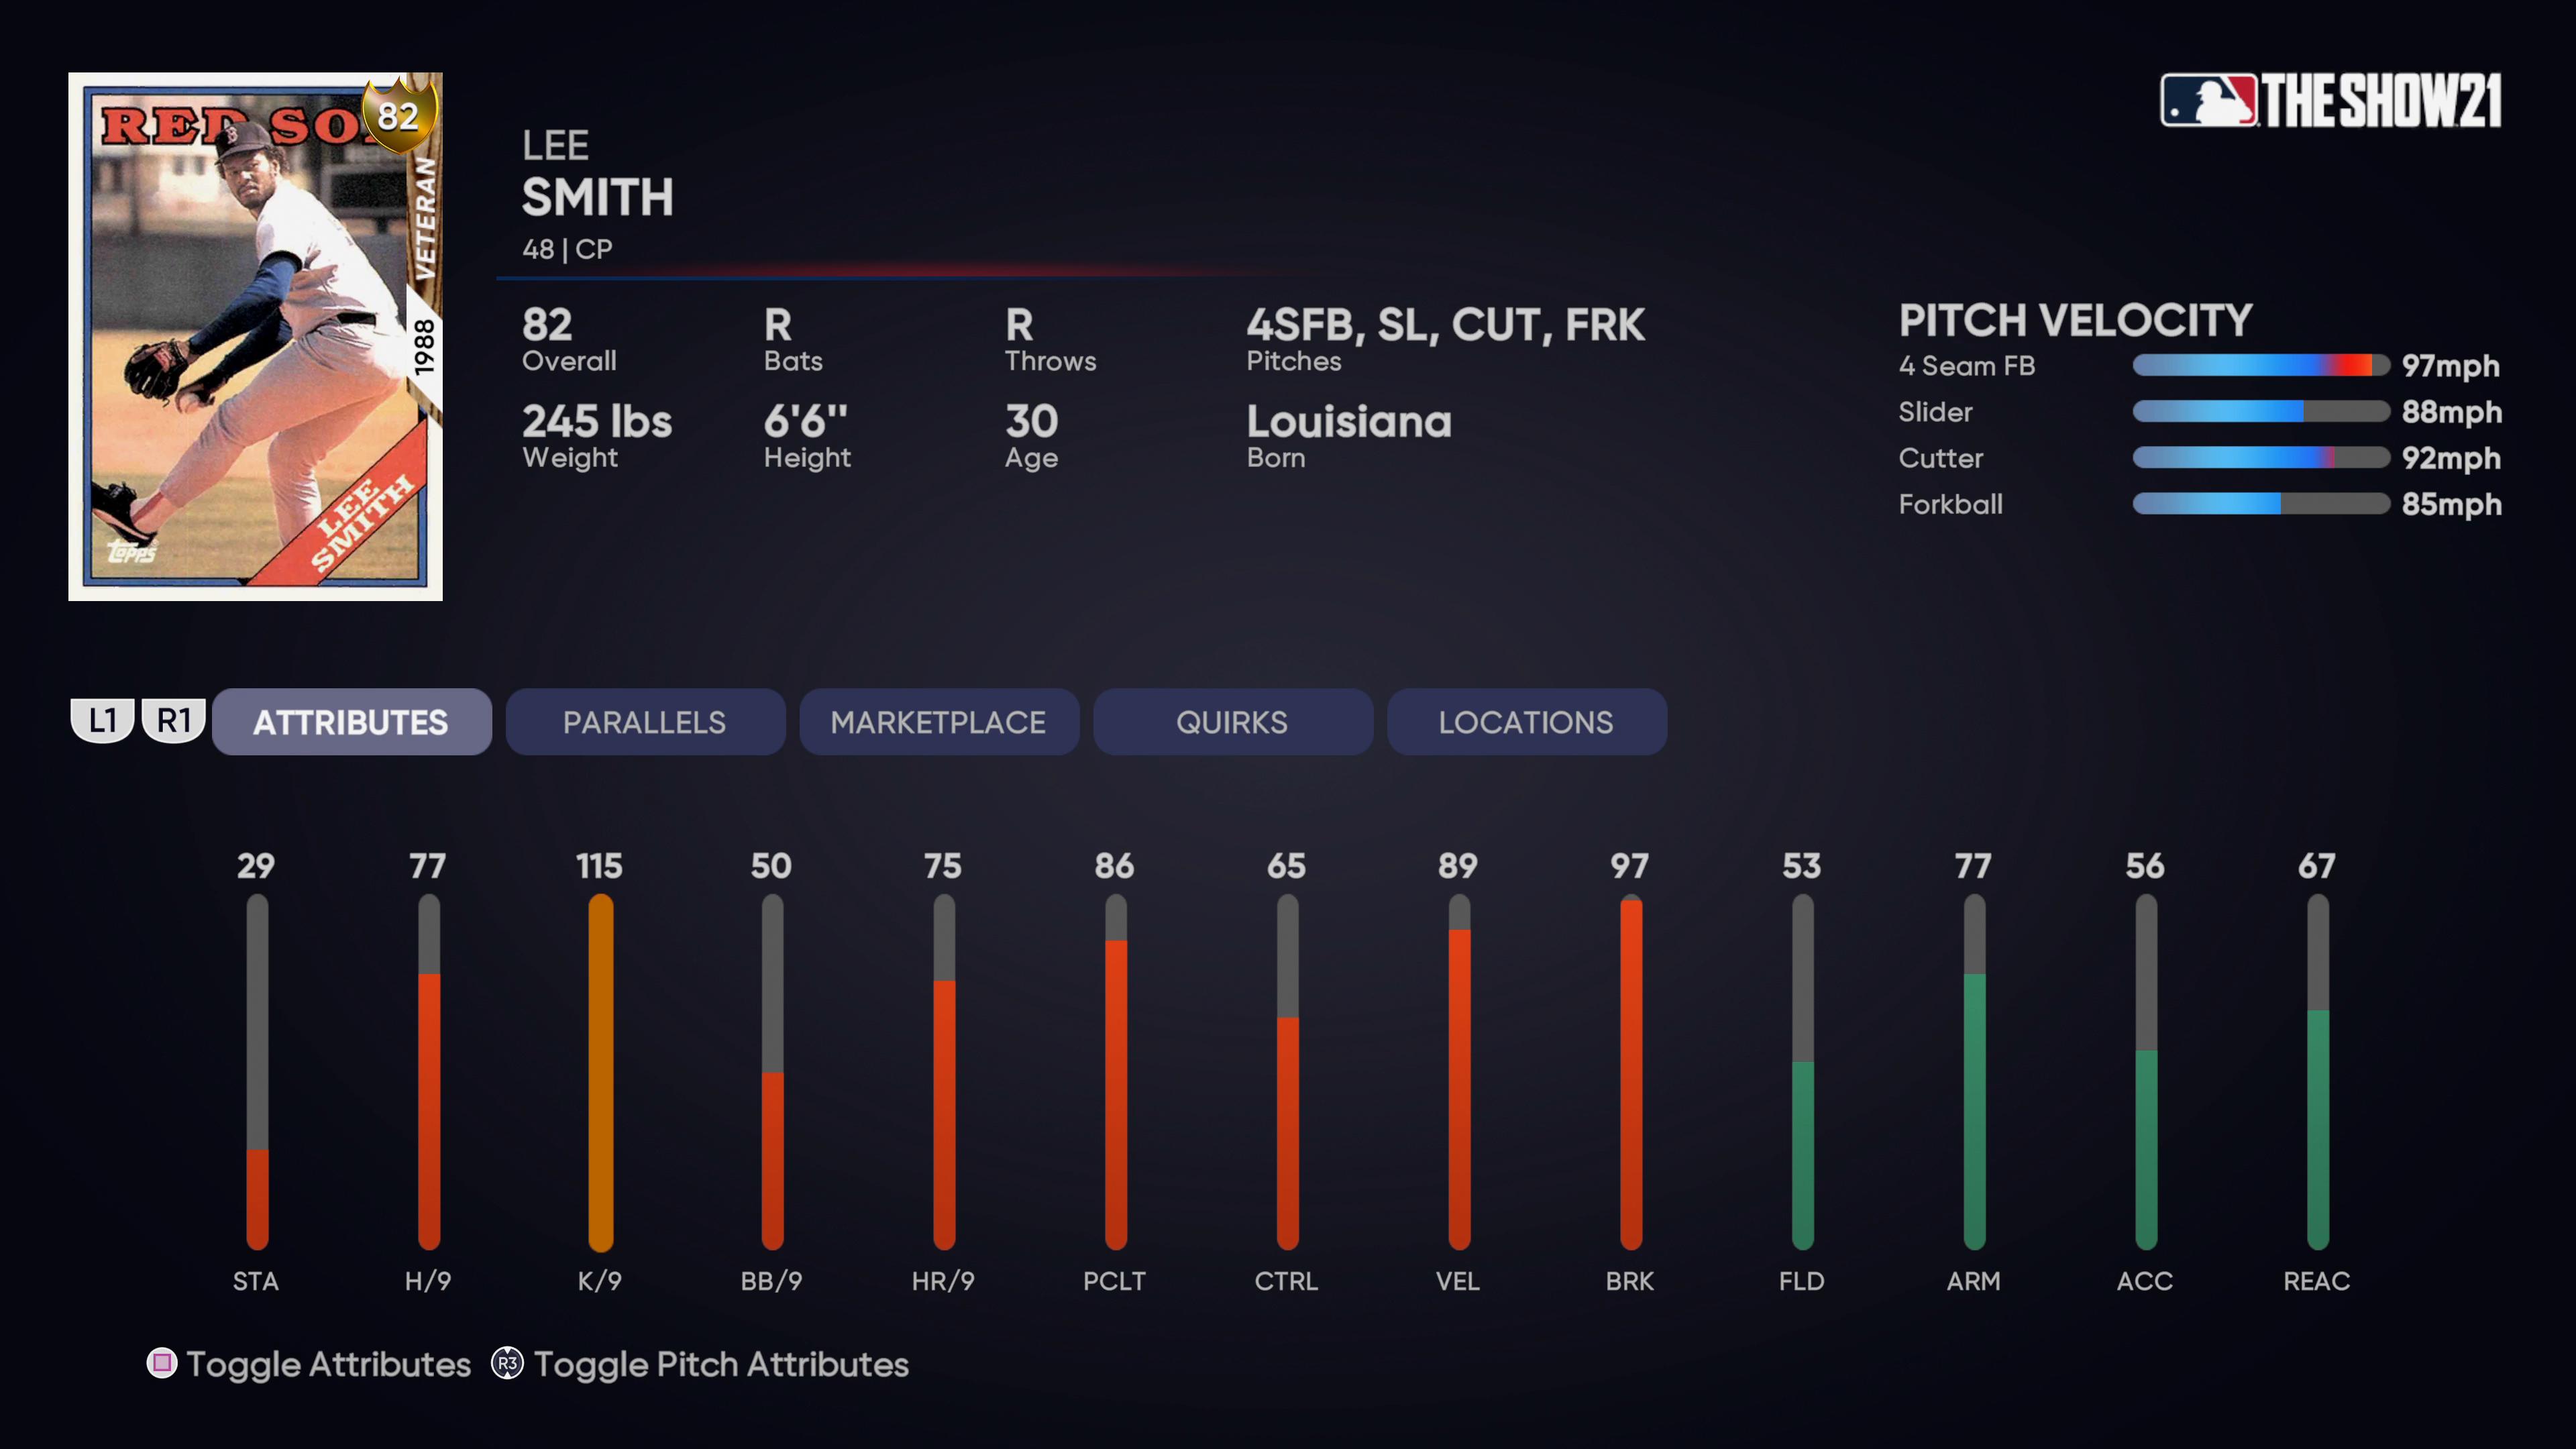 MLB The Show 21 - Pennant Race Rewards_2021-04-17_03-12-57